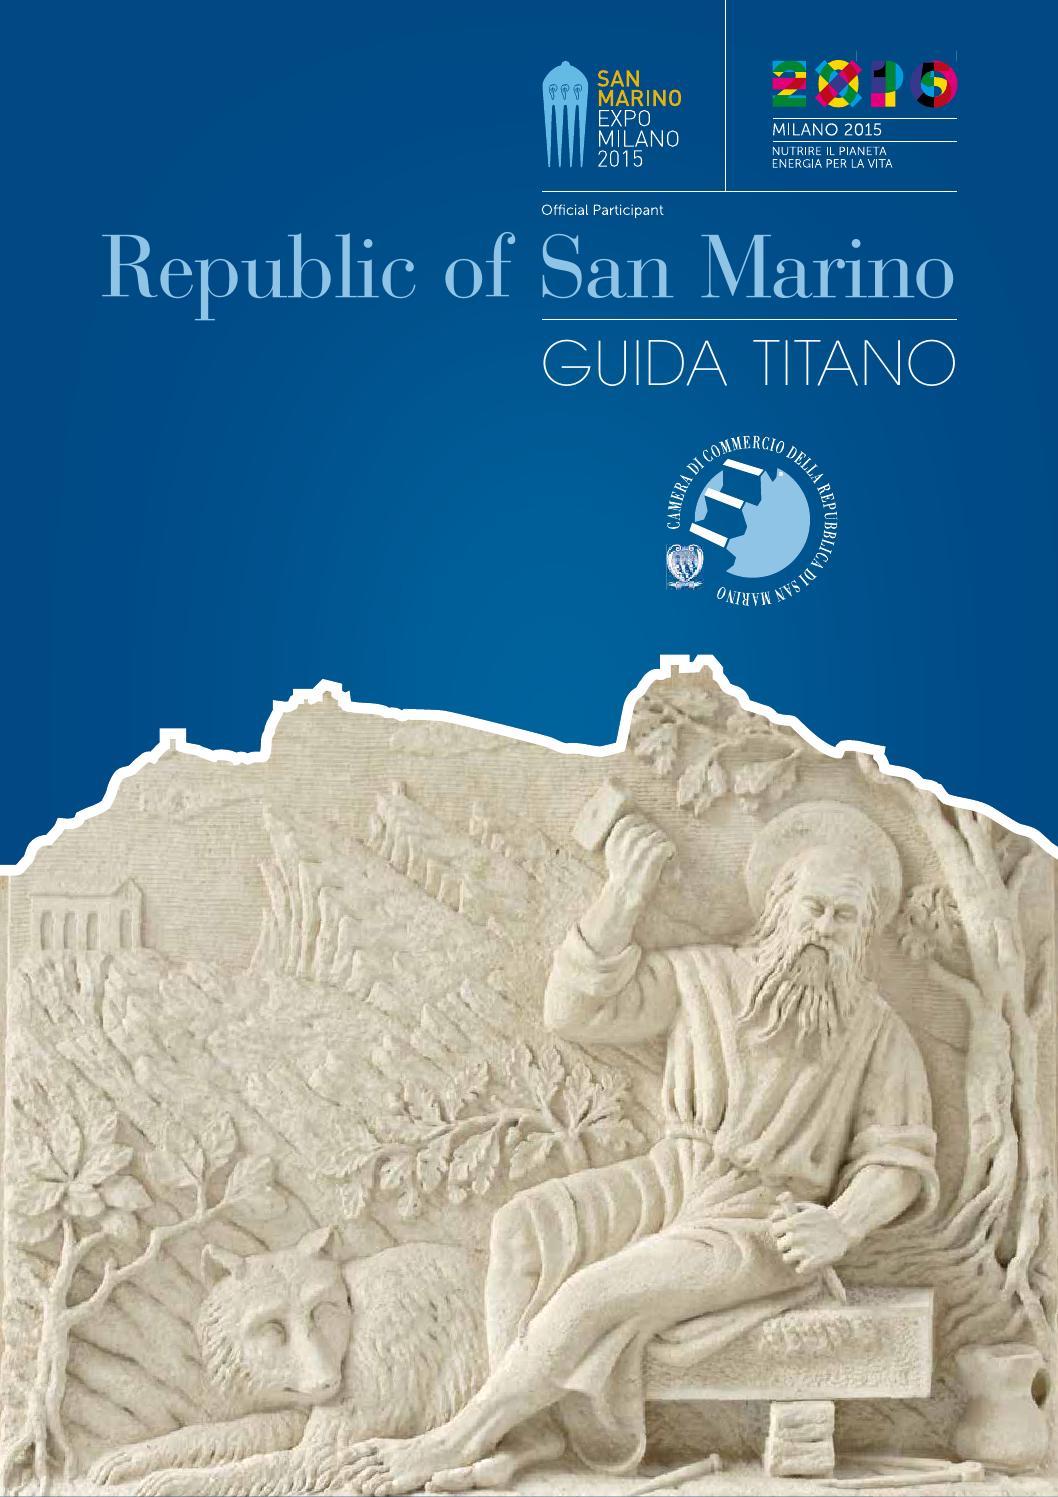 Guida titano 2016 san marino country profile and business ...